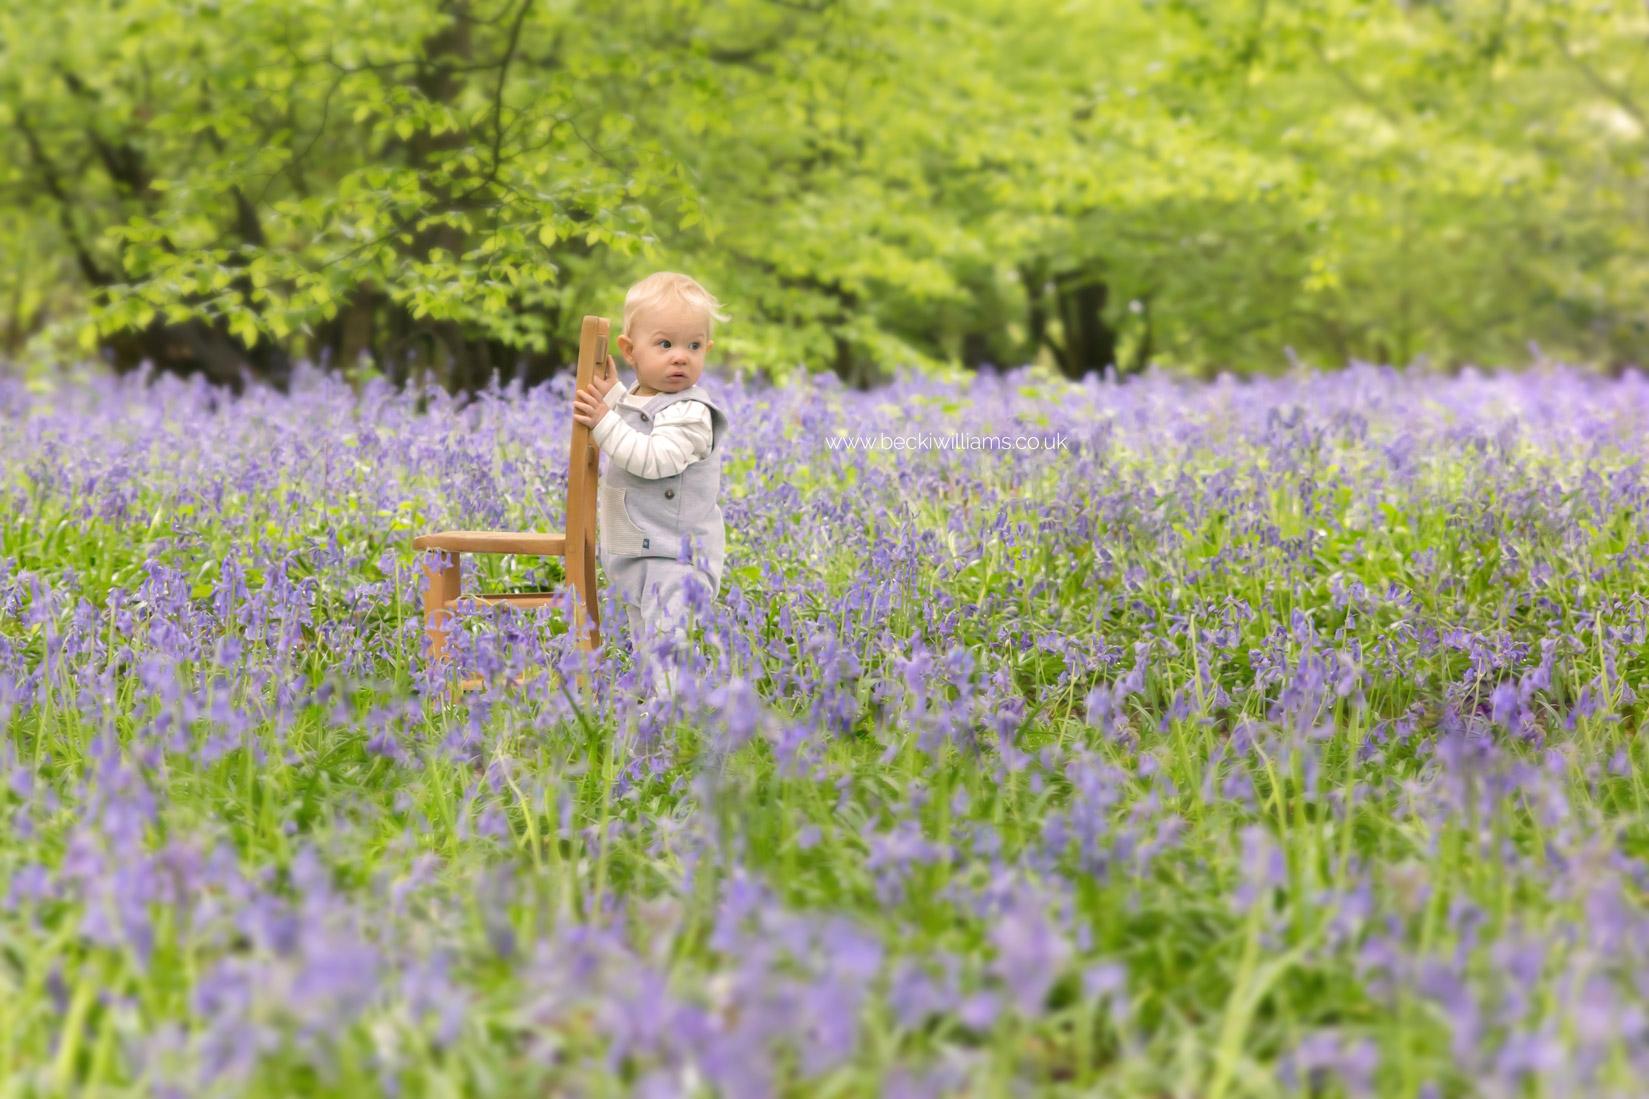 bluebells-st-albans-becki-williams-photography-1.jpg